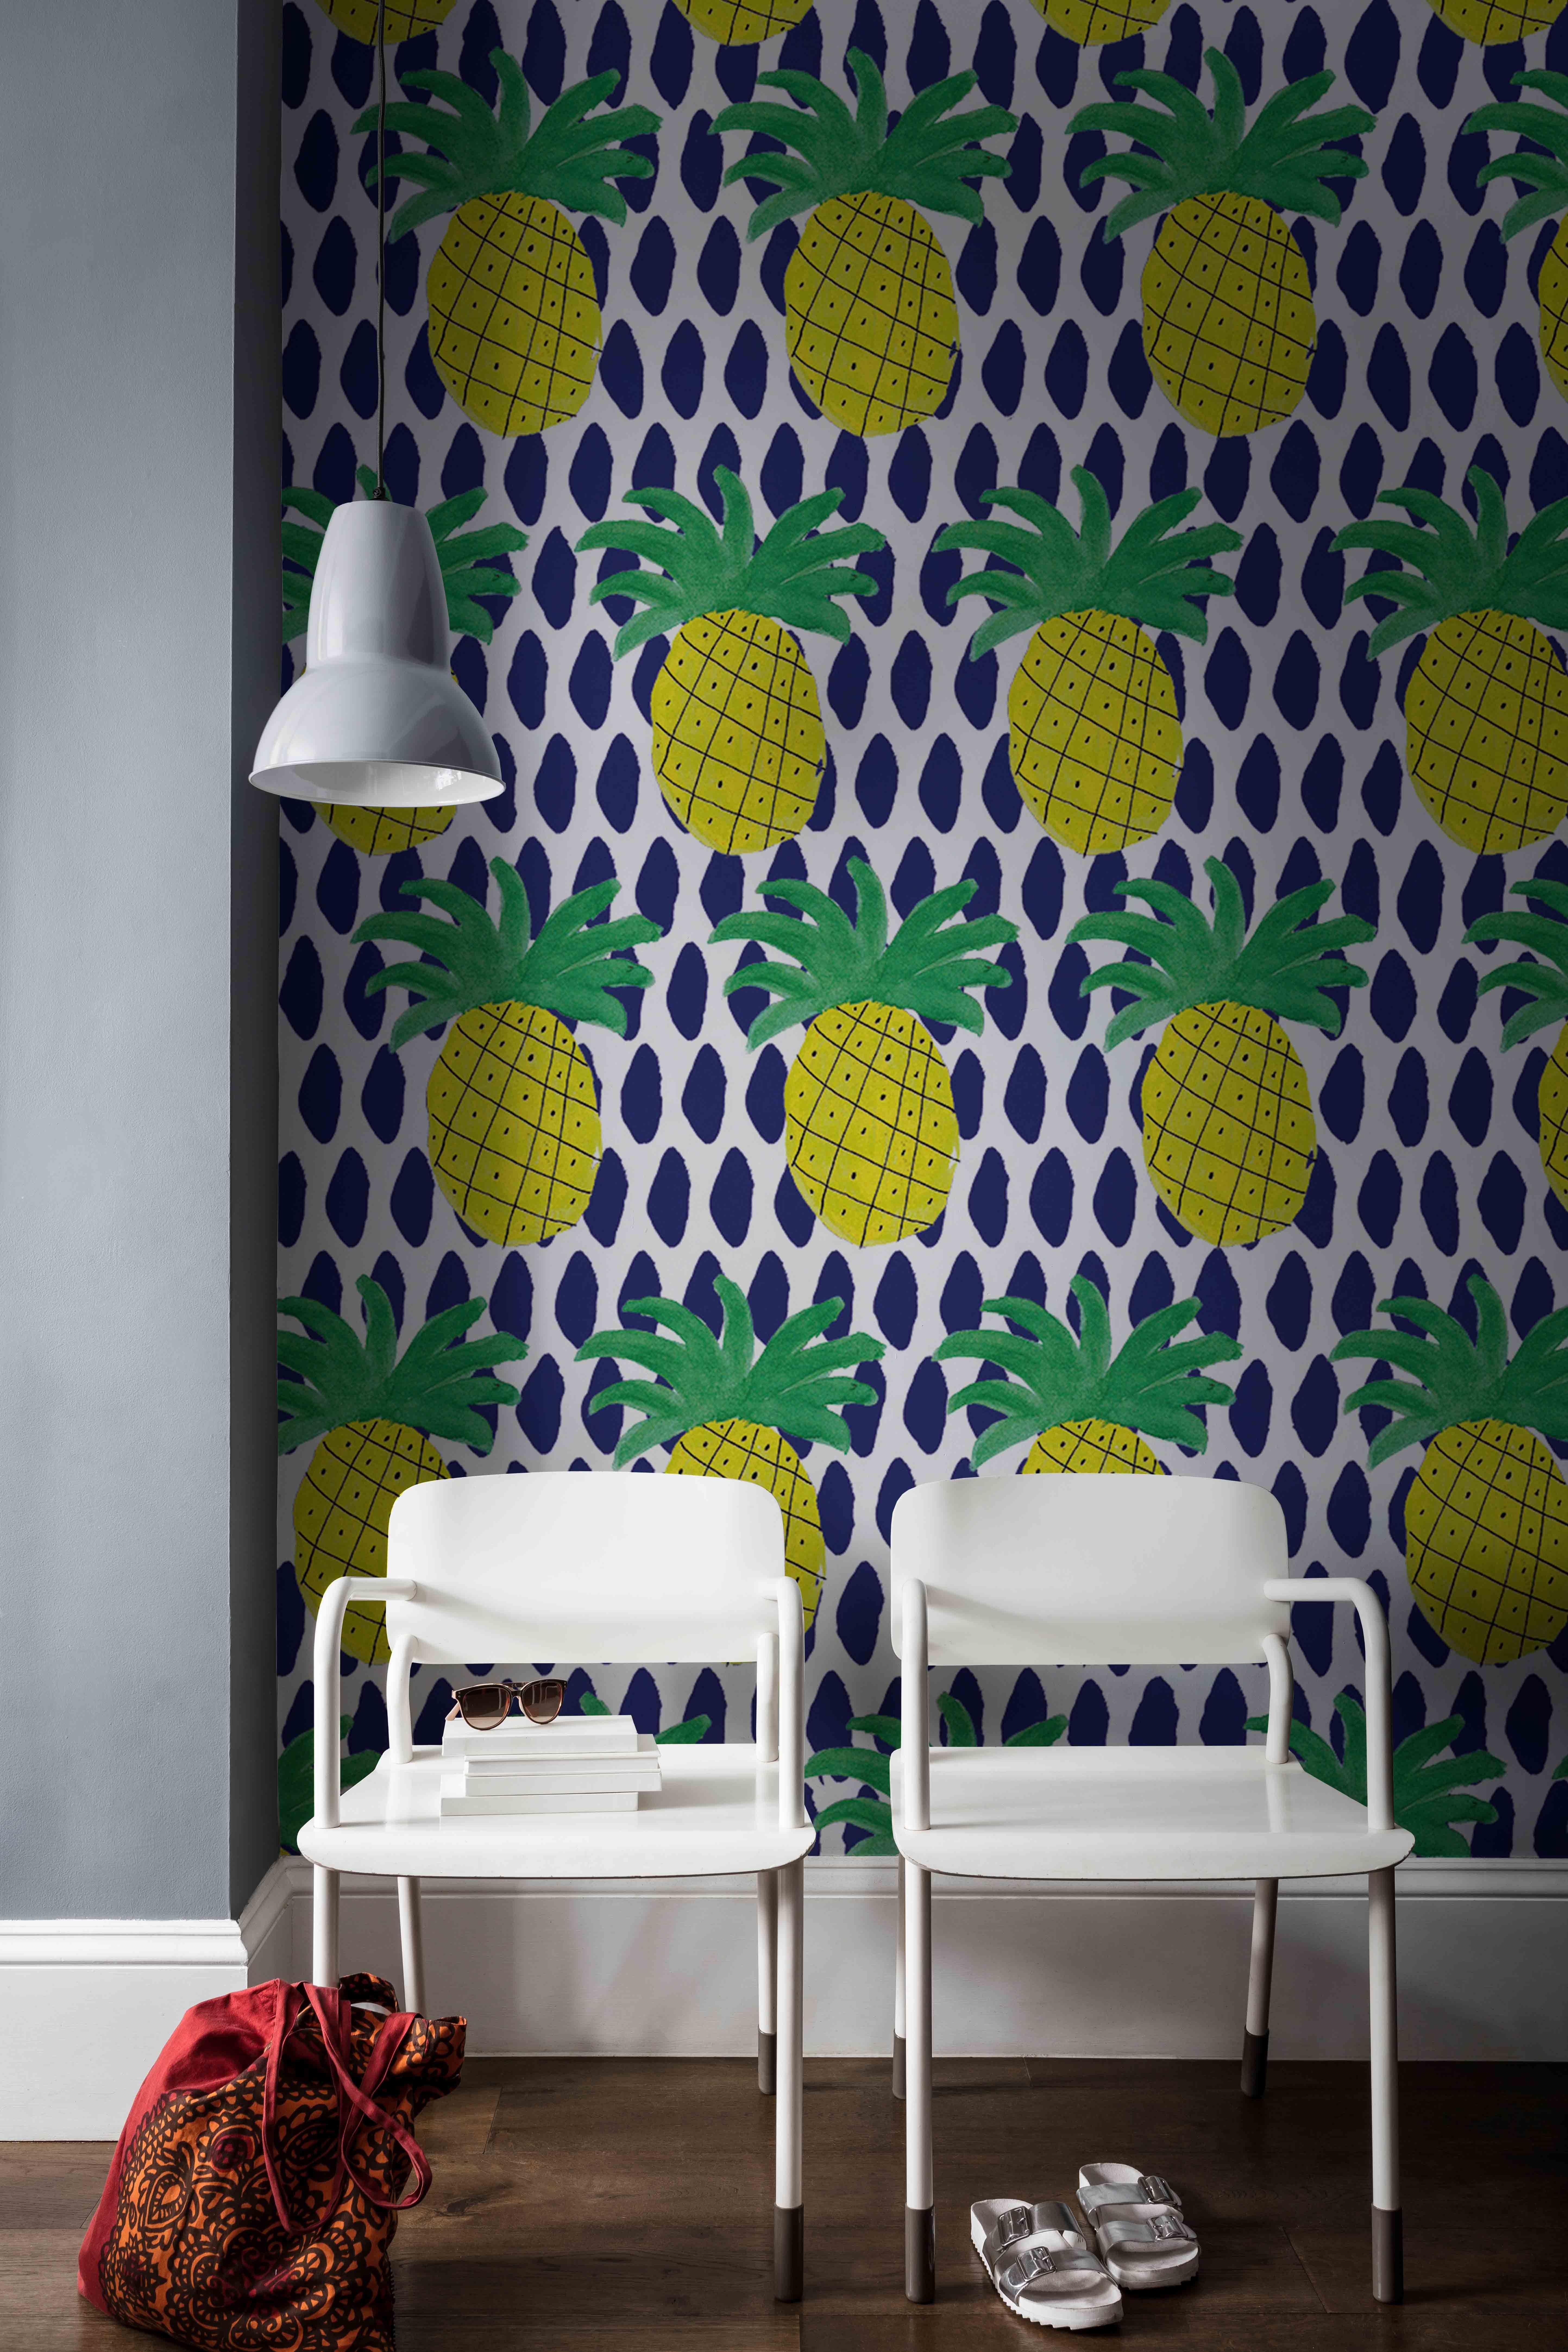 Pineapple Iv Mural By Kendra Dandy Pinterest Wall Murals